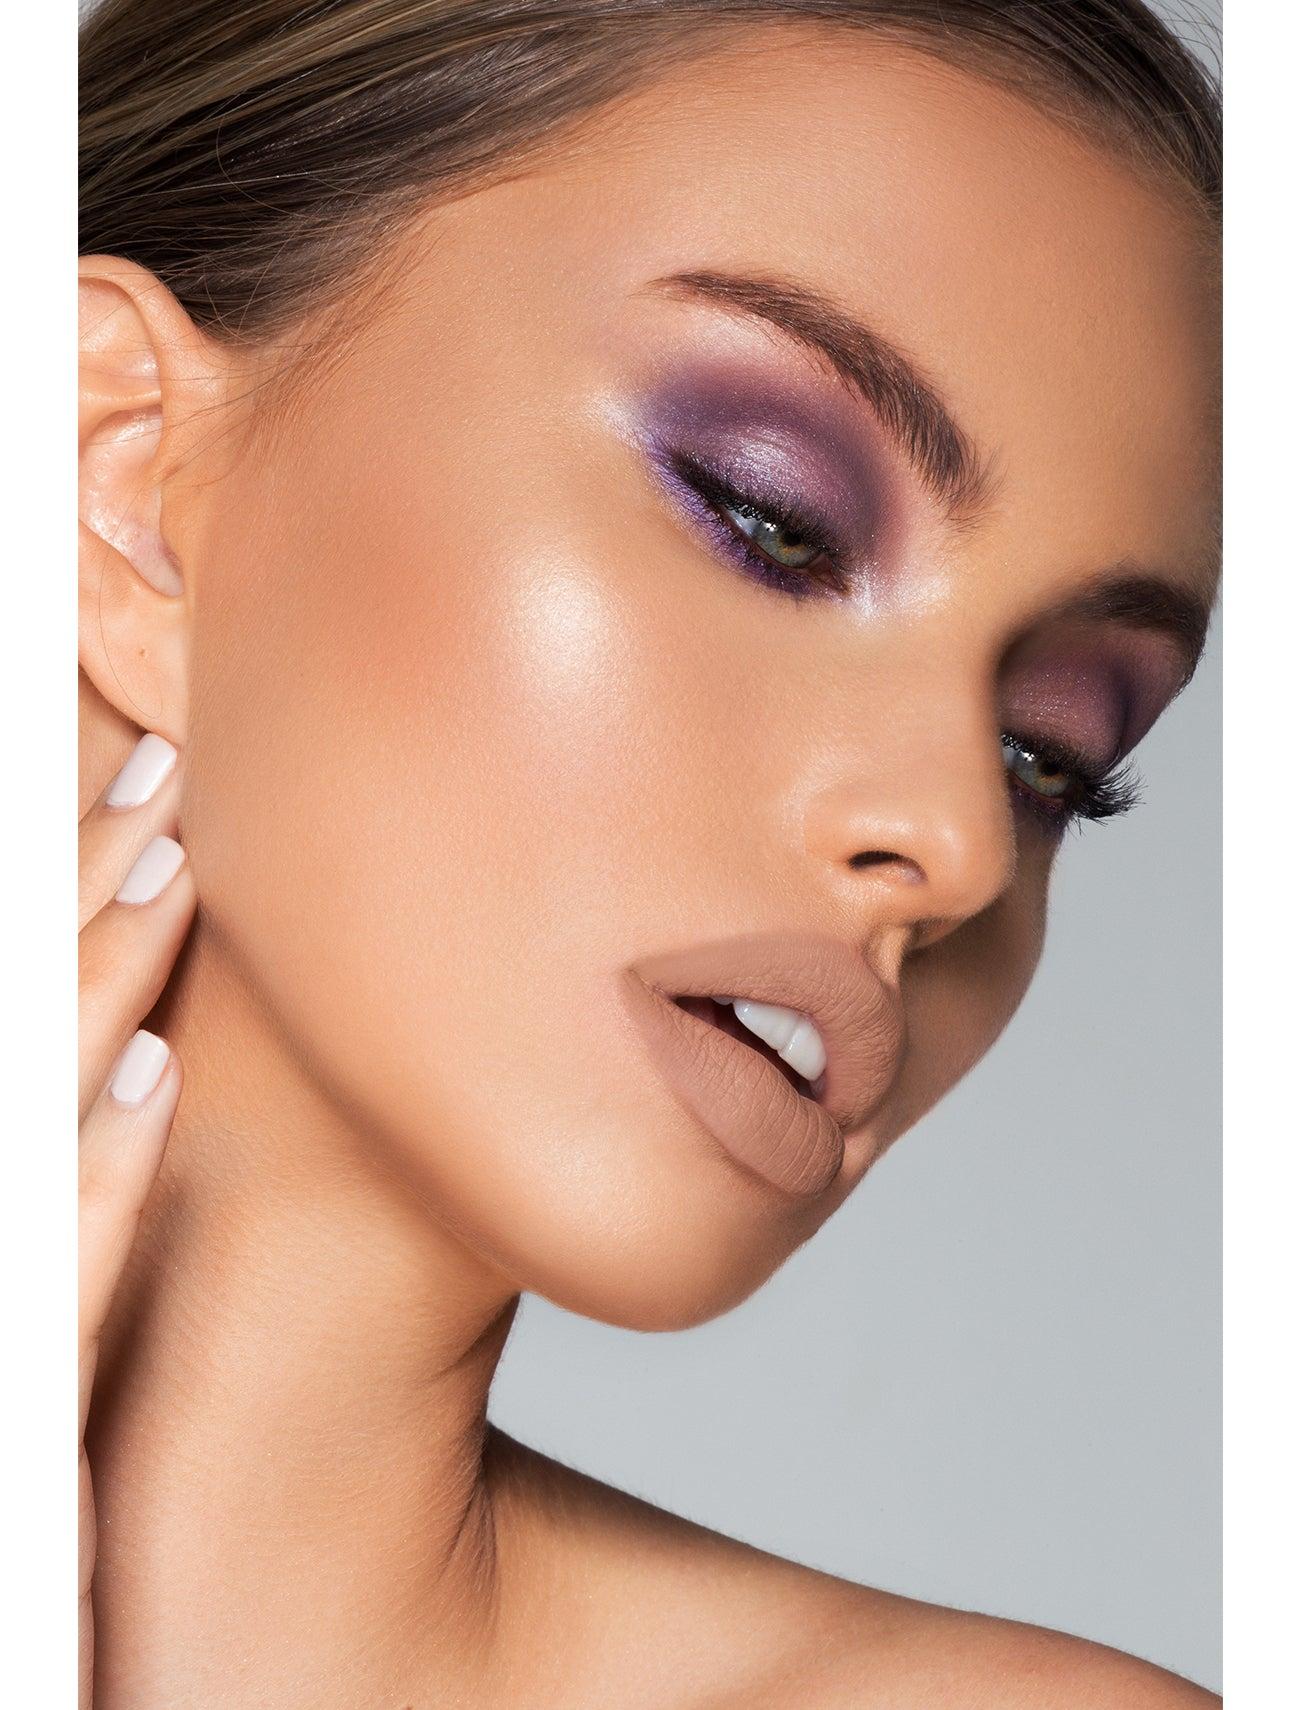 Kylie Cosmetics - Kyshadow, The Purple Palette